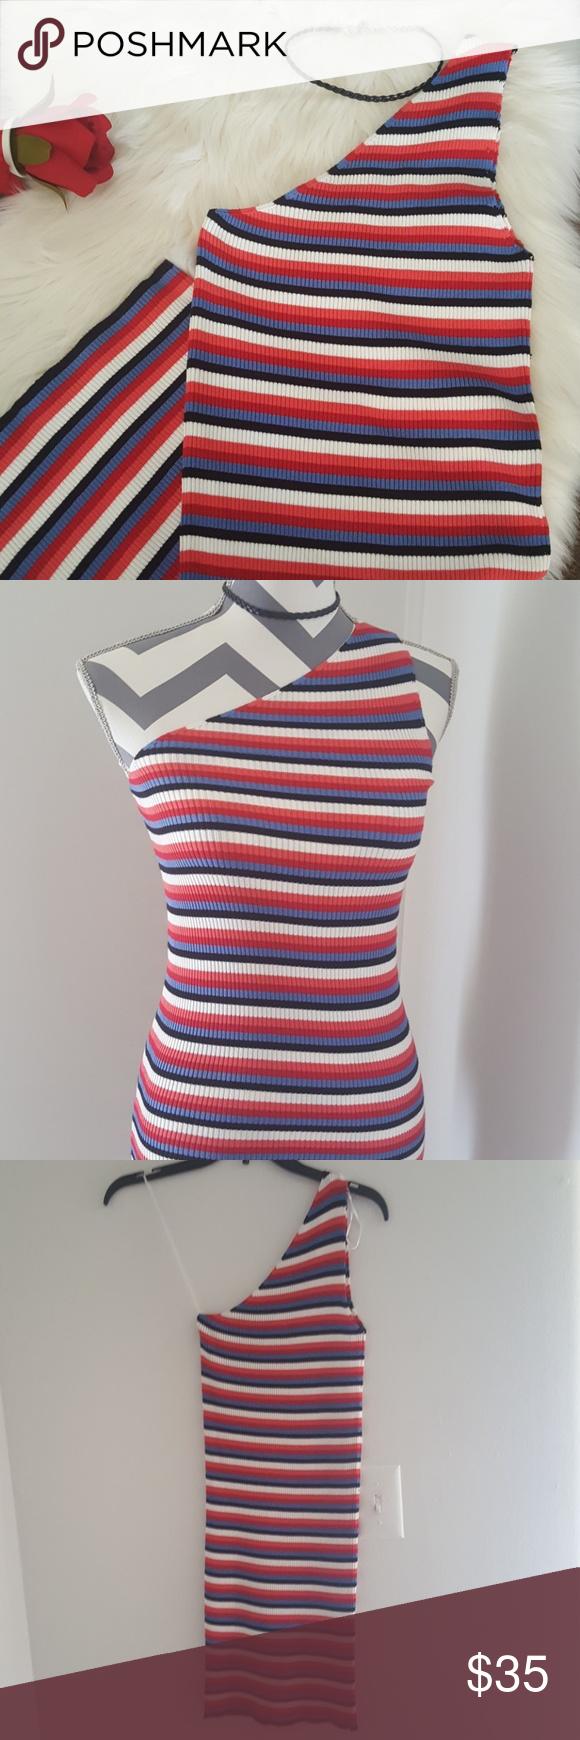 70156a13 ZARA KNIT one shoulder striped knit dress size S NWT. Never been worn.  Stretch. Form fitting. One shoulder knit dress. Light knit.Stripes colors:  red blaxk ...